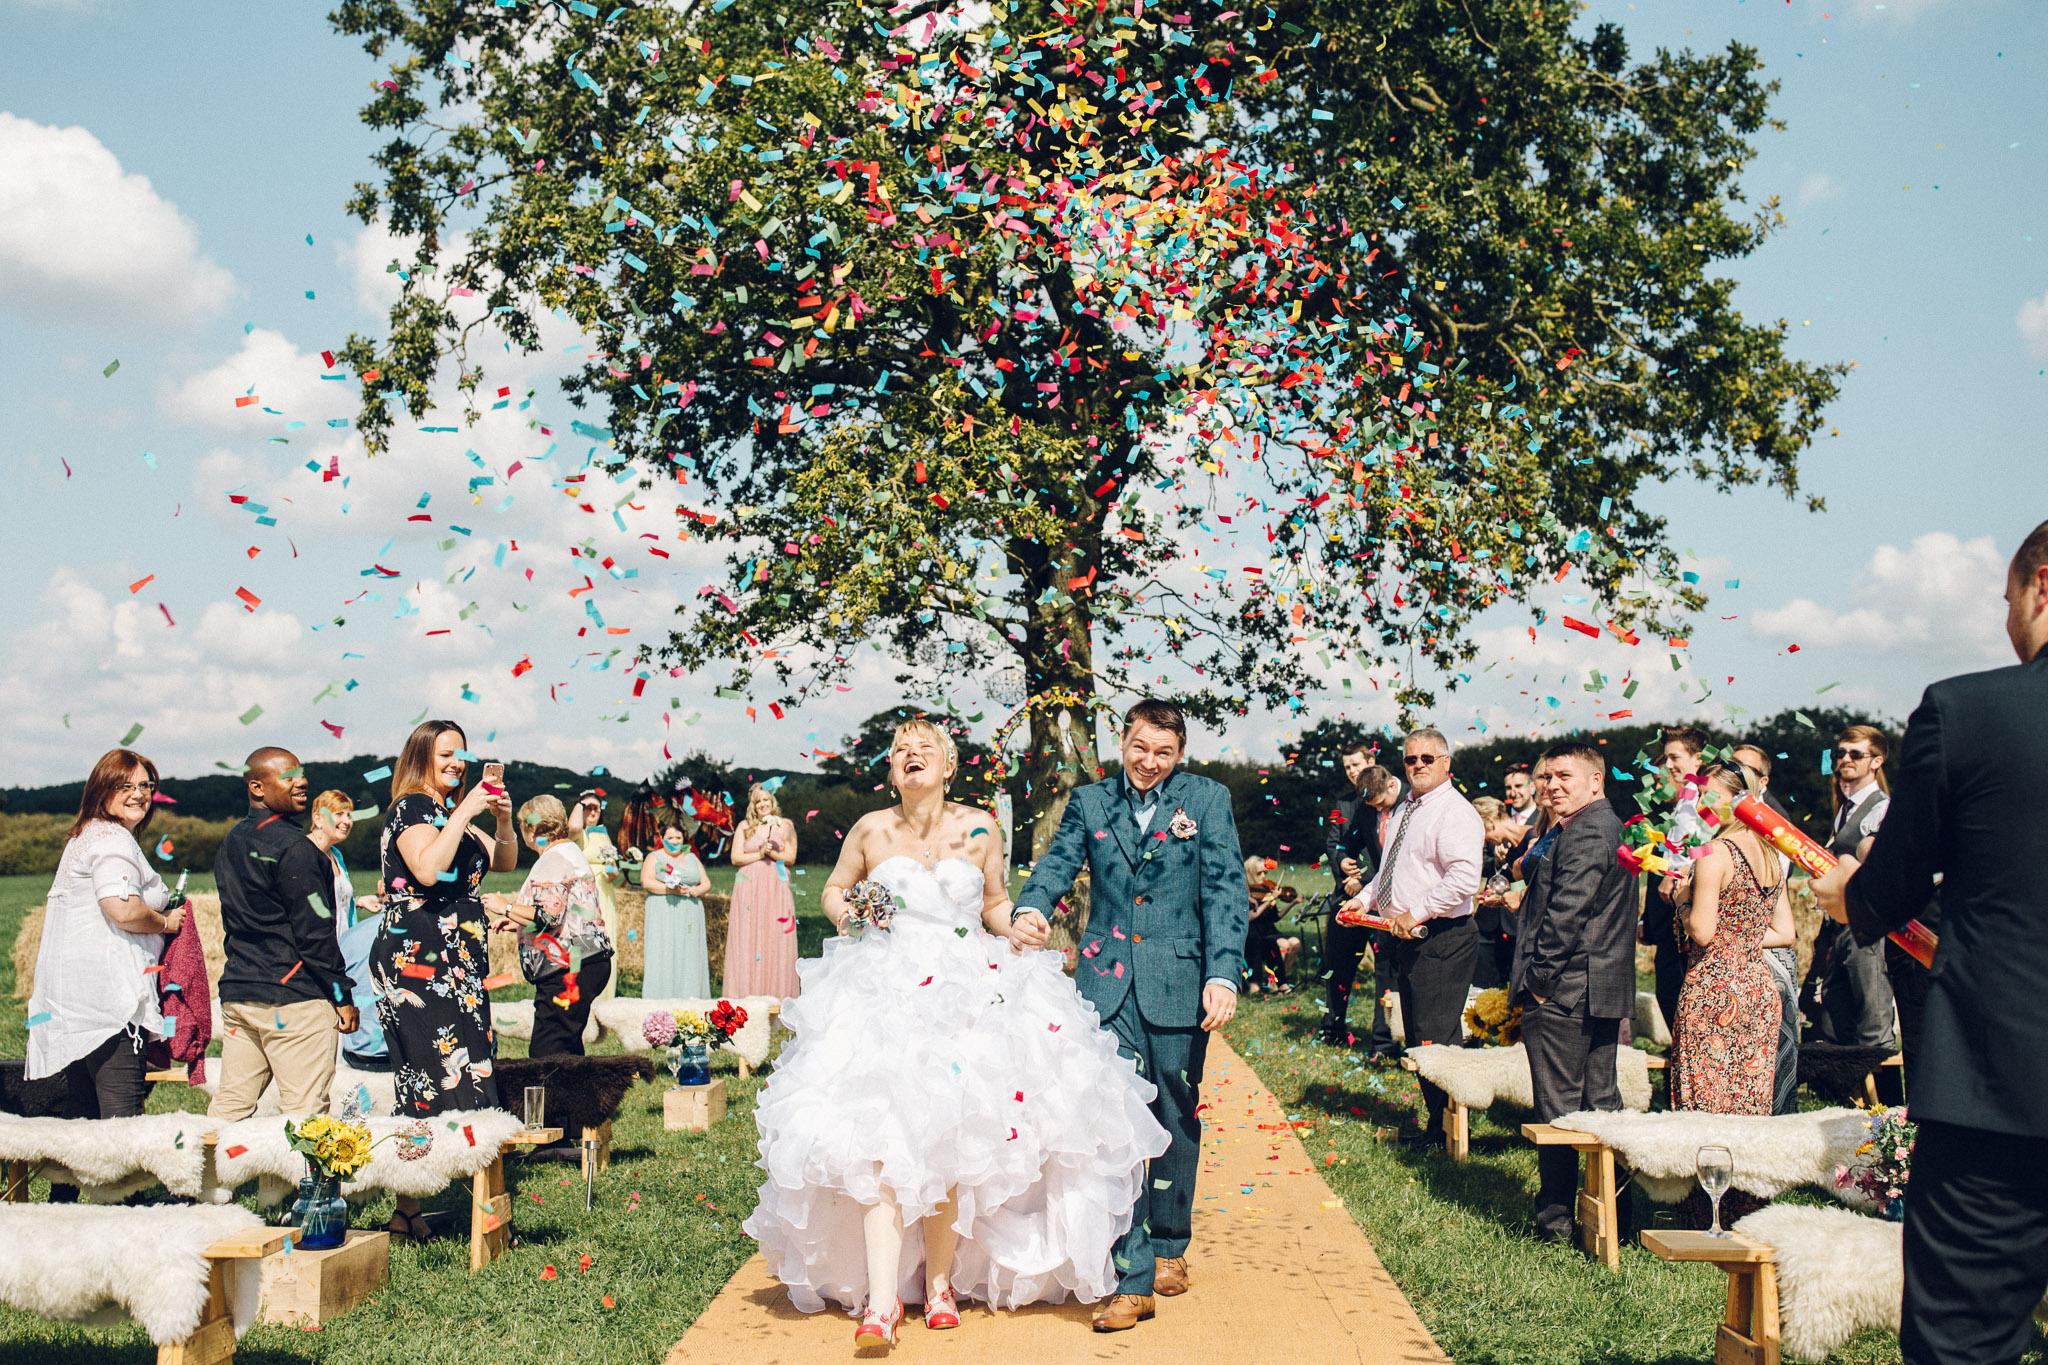 Fun Confetti Canon Alternative Wedding Photography - I Do The Country Wed, Quainton